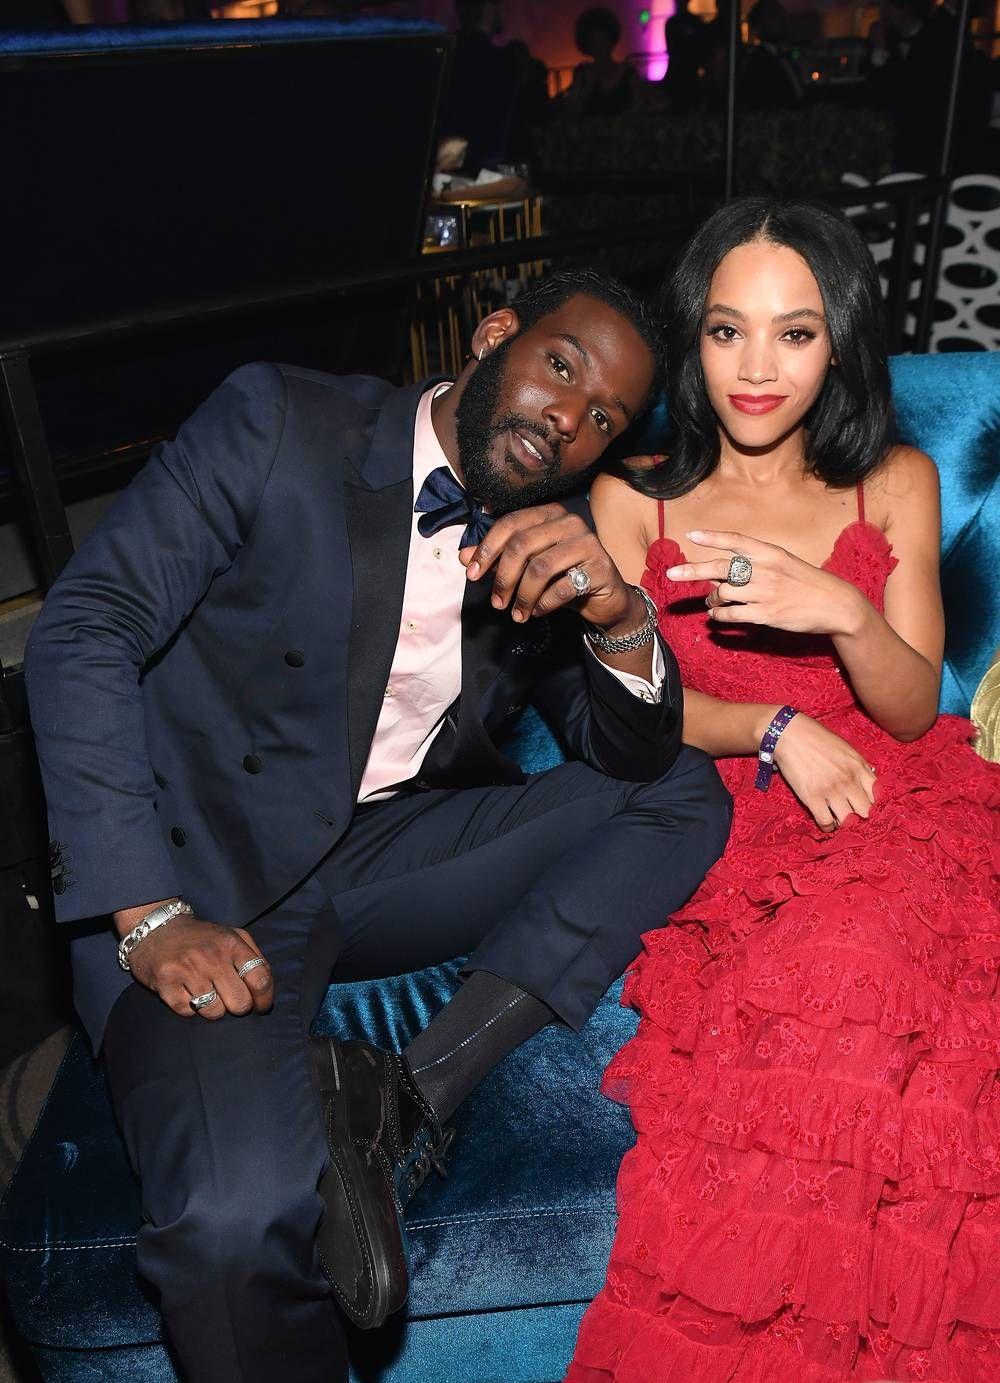 Jan 2019. Issa Rae, 33, and actor Kofi Siriboe, 23, are dating, MTO News has confirmed.